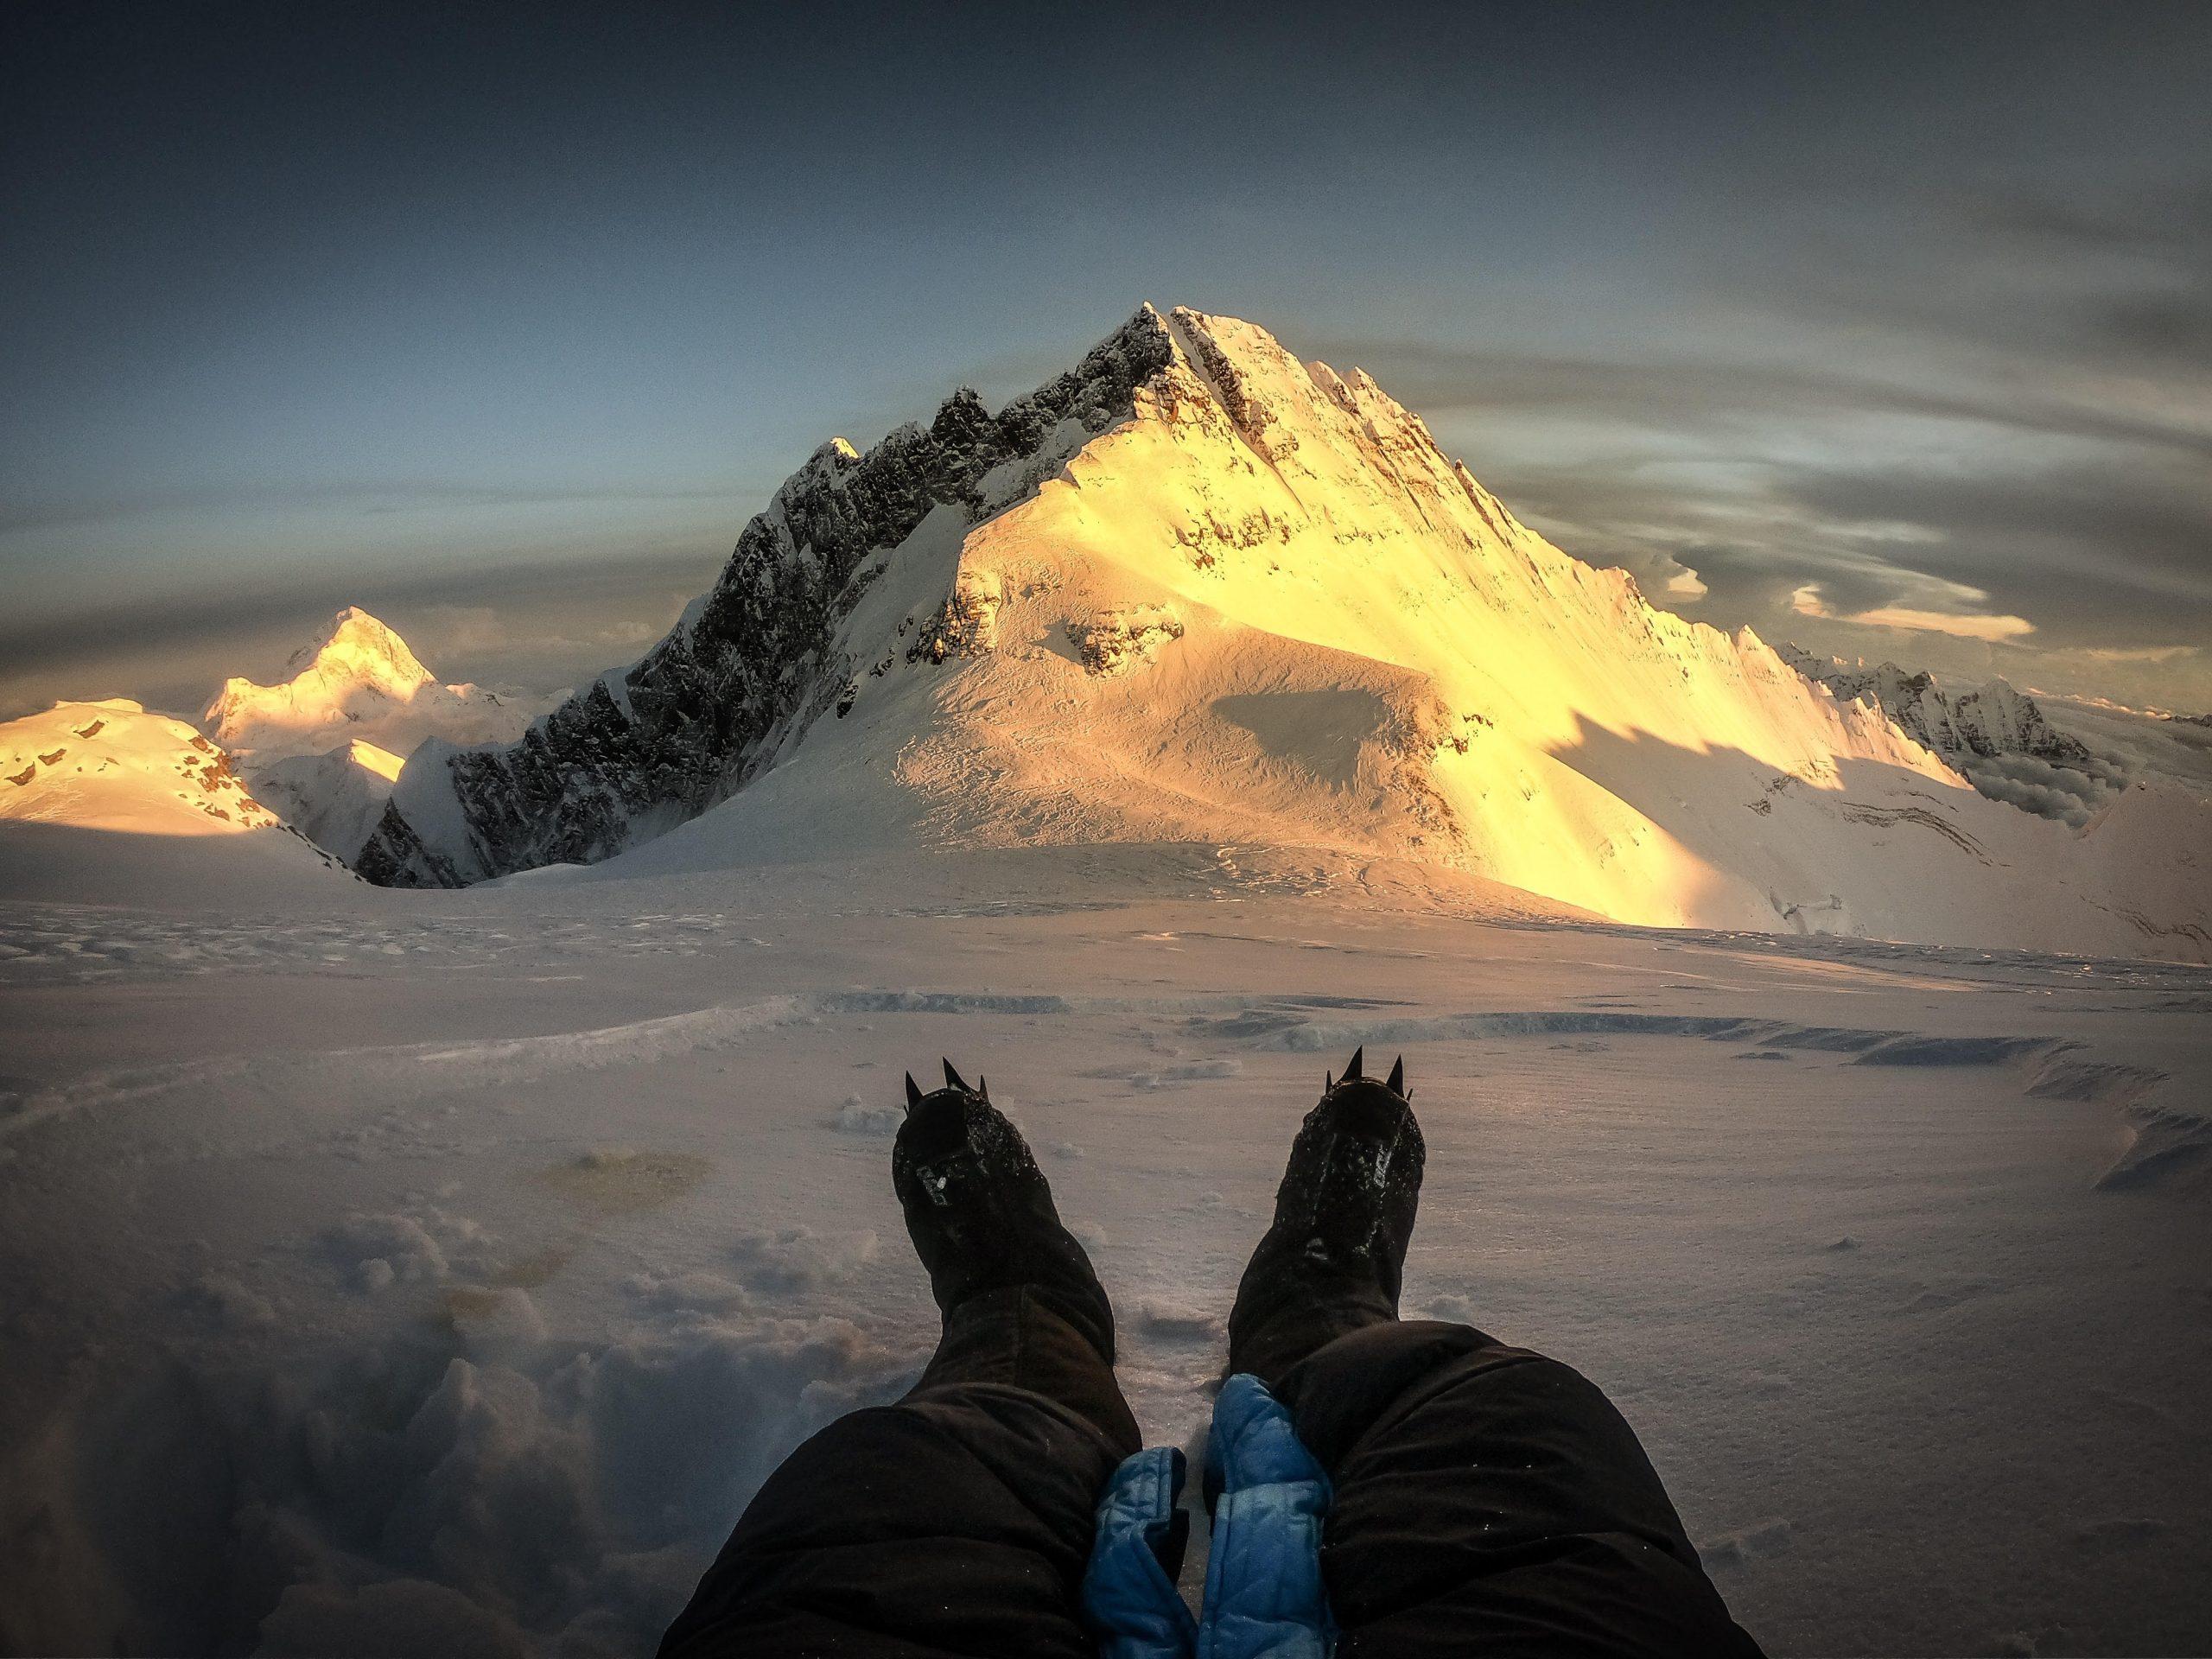 Kilian auf 8100 m am Mt. Everest mit Blick auf den Lhotse. Foto: Kilian Jornet